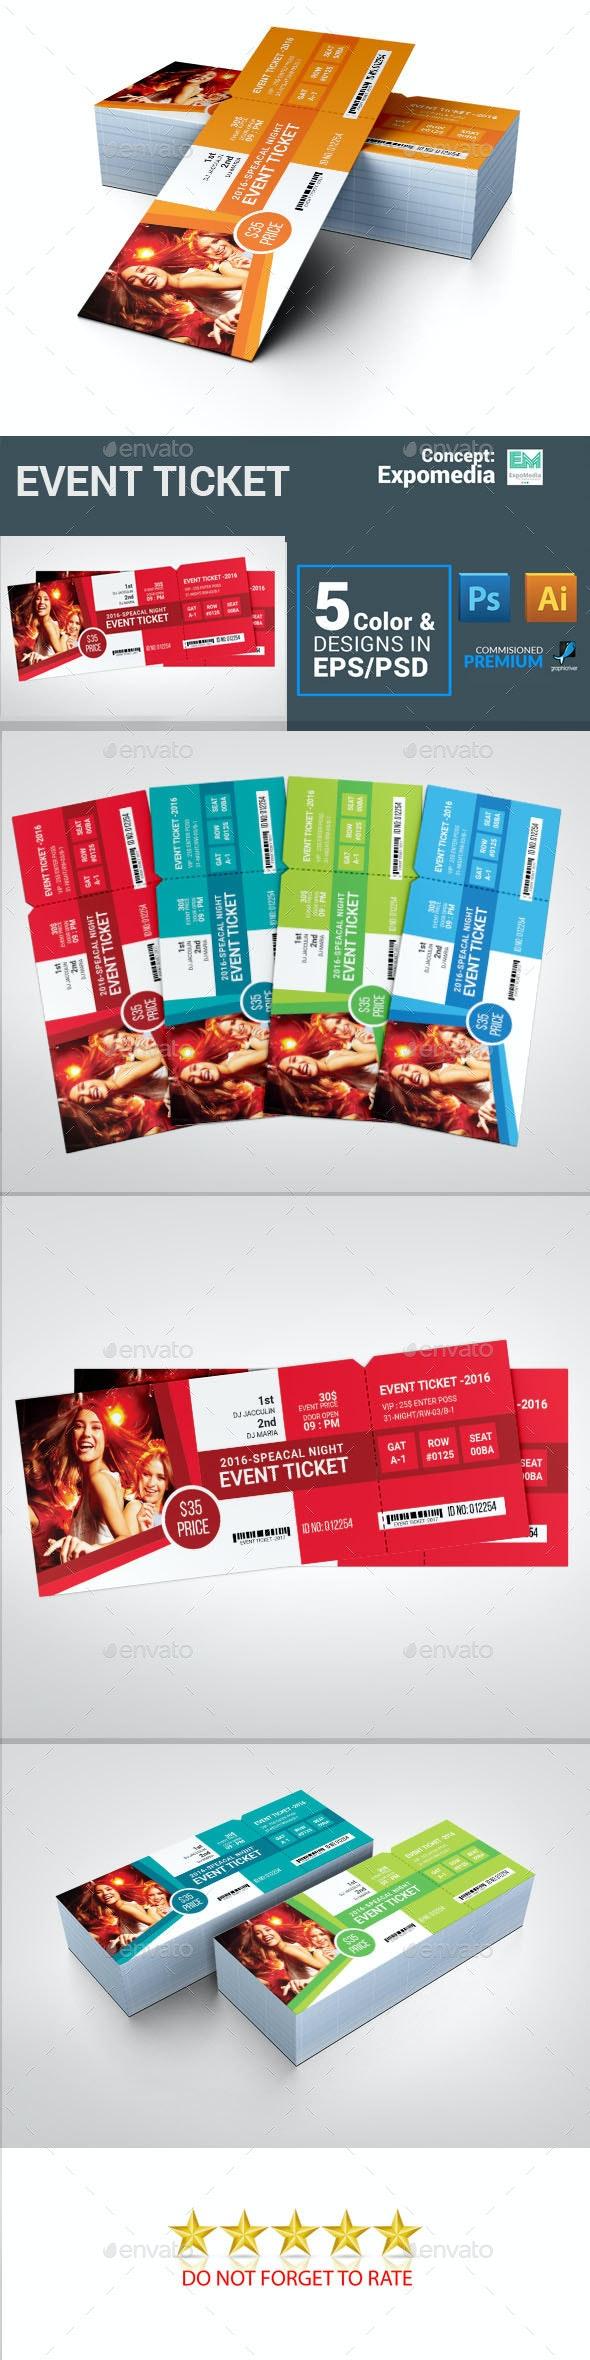 Ticket Event Ticket - Cards & Invites Print Templates